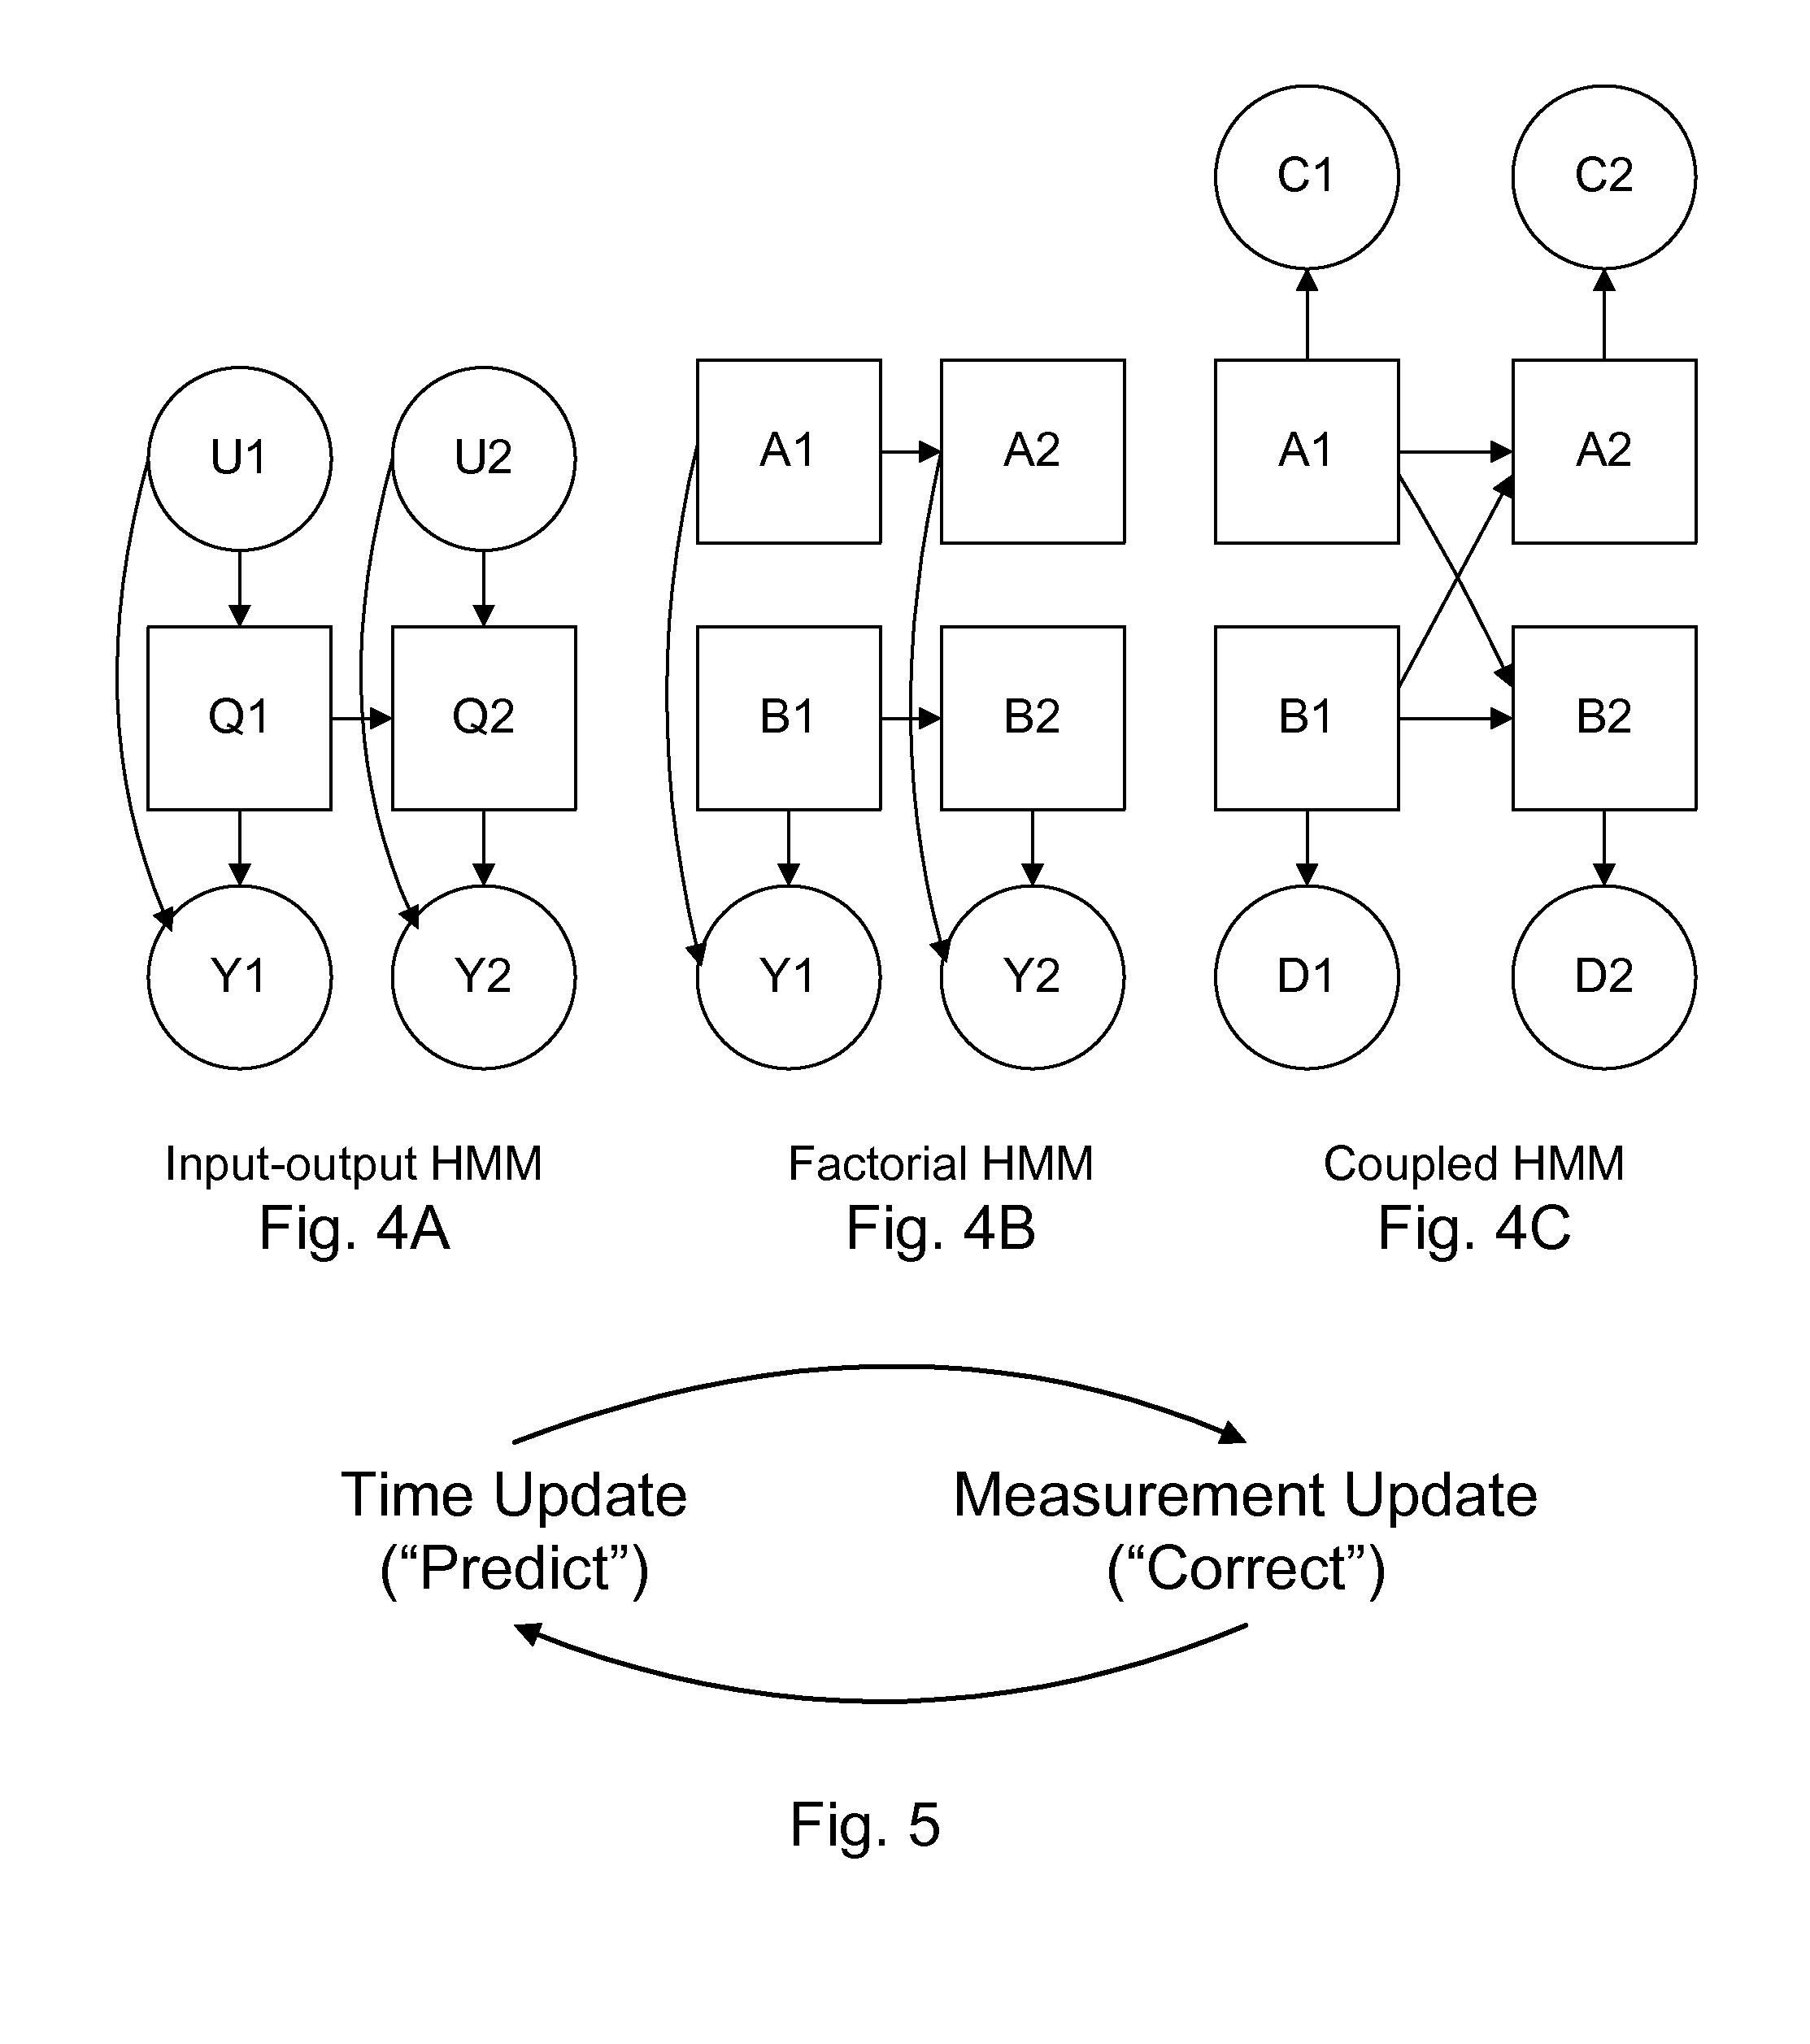 Patent US 8,600,830 B2